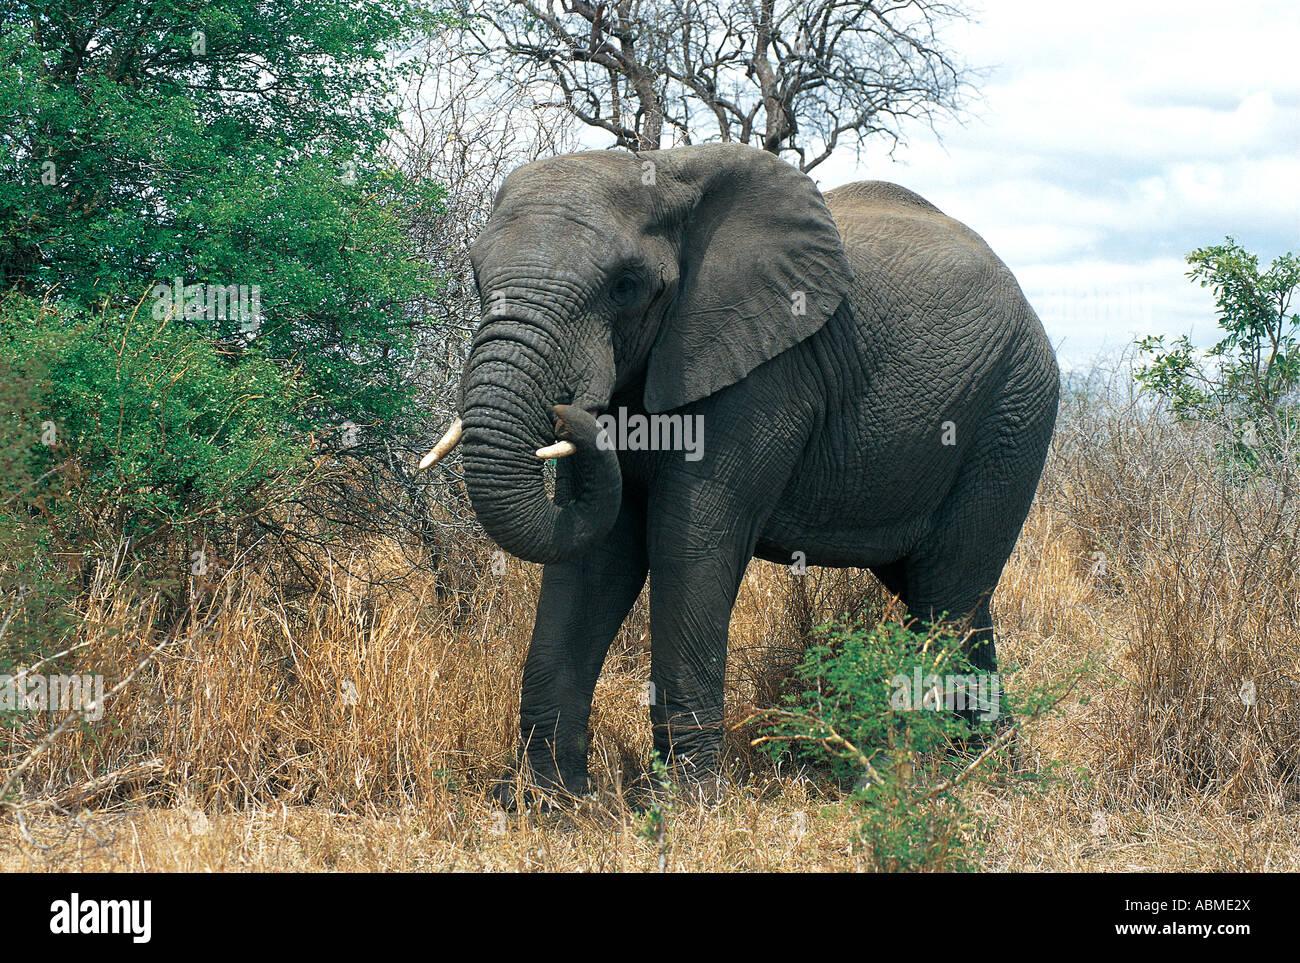 African Elephant Kruger National Park South Africa - Stock Image